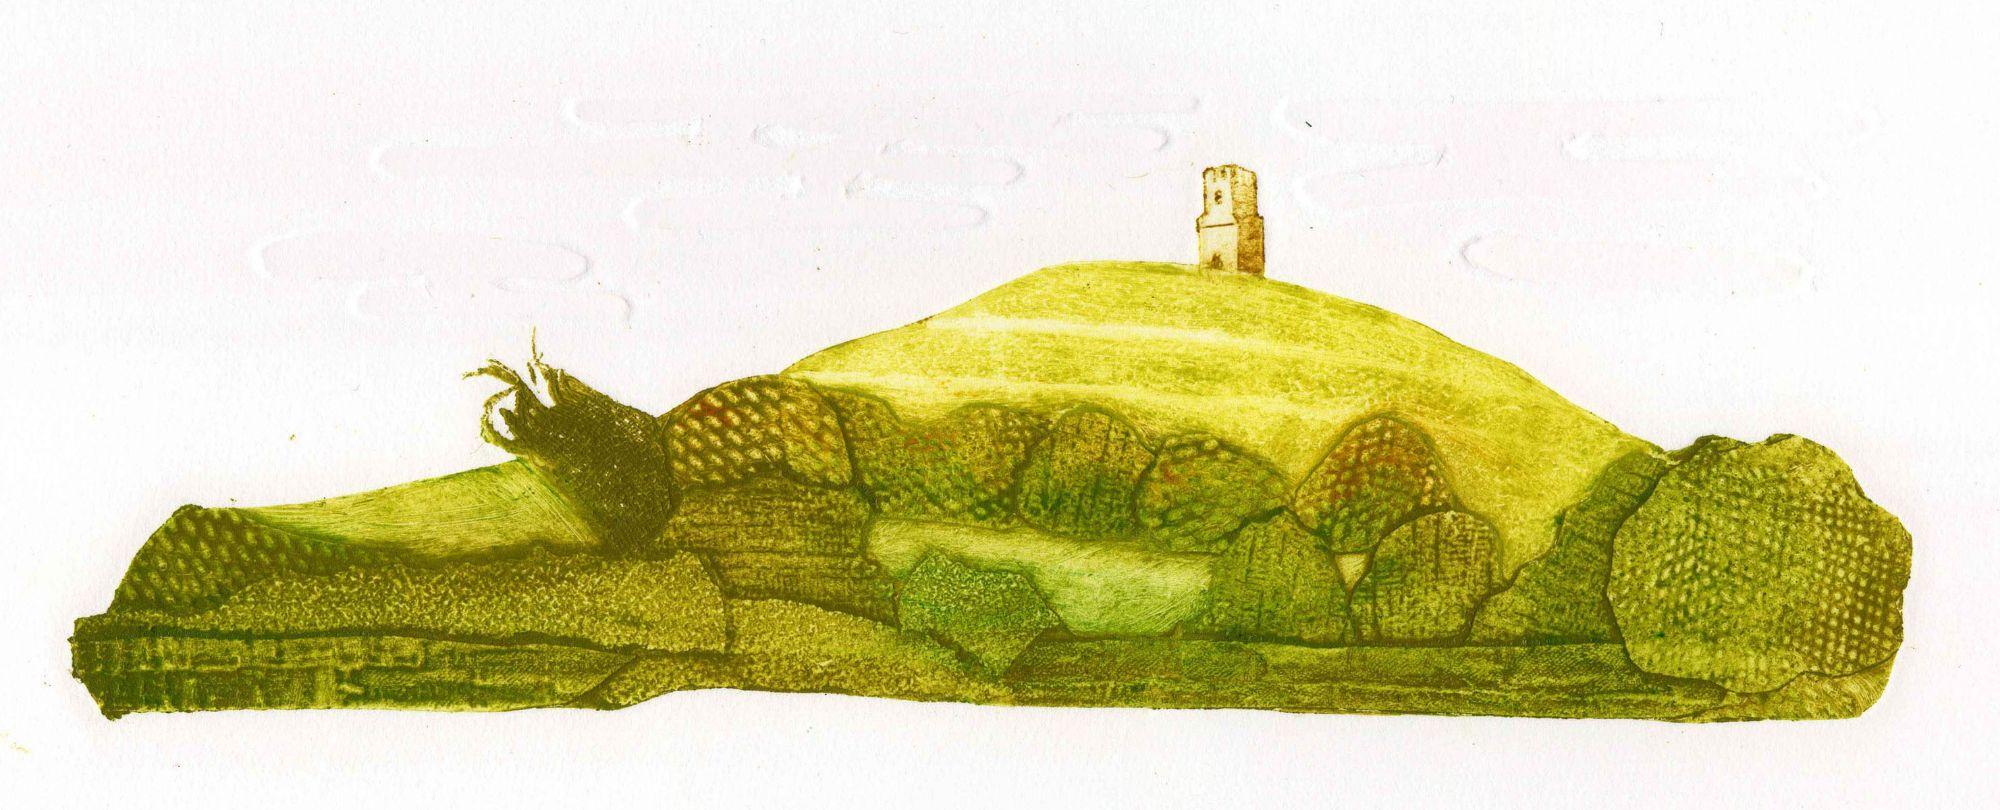 collagraph print of Glastonbury Tor